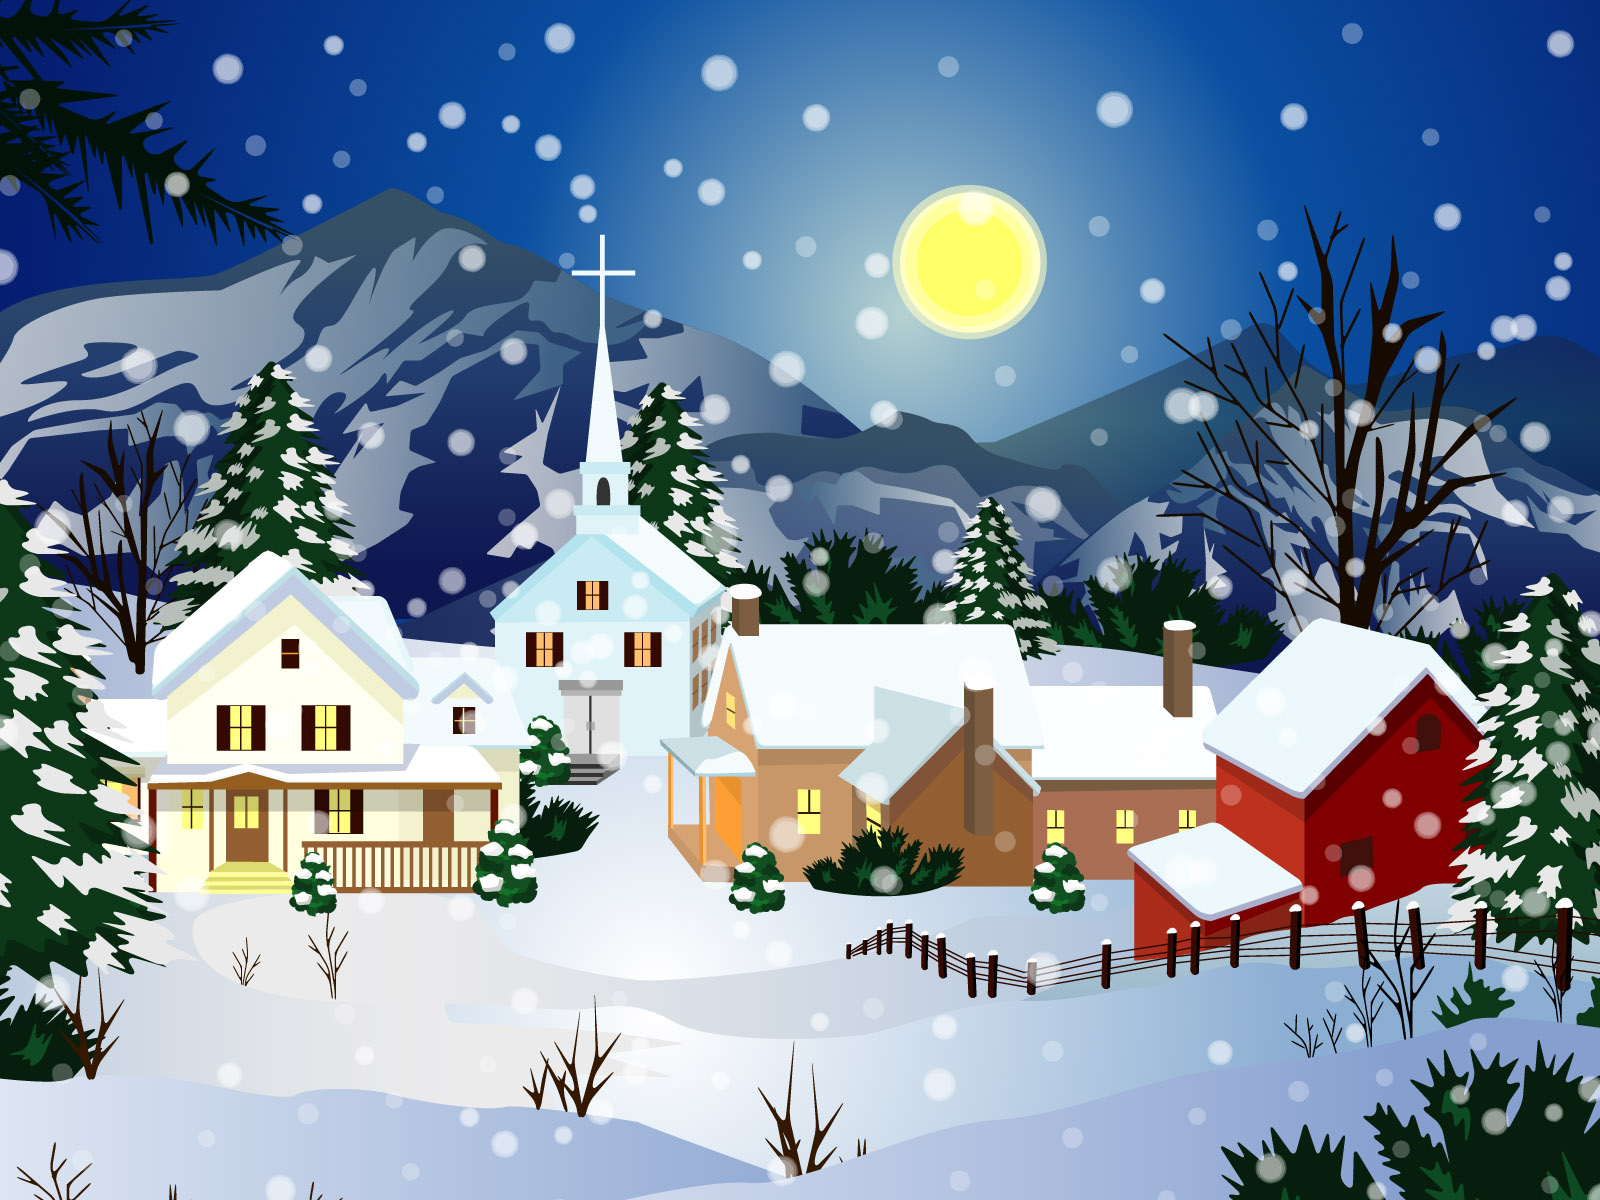 75 ] Free Christmas Nature Wallpaper On WallpaperSafari